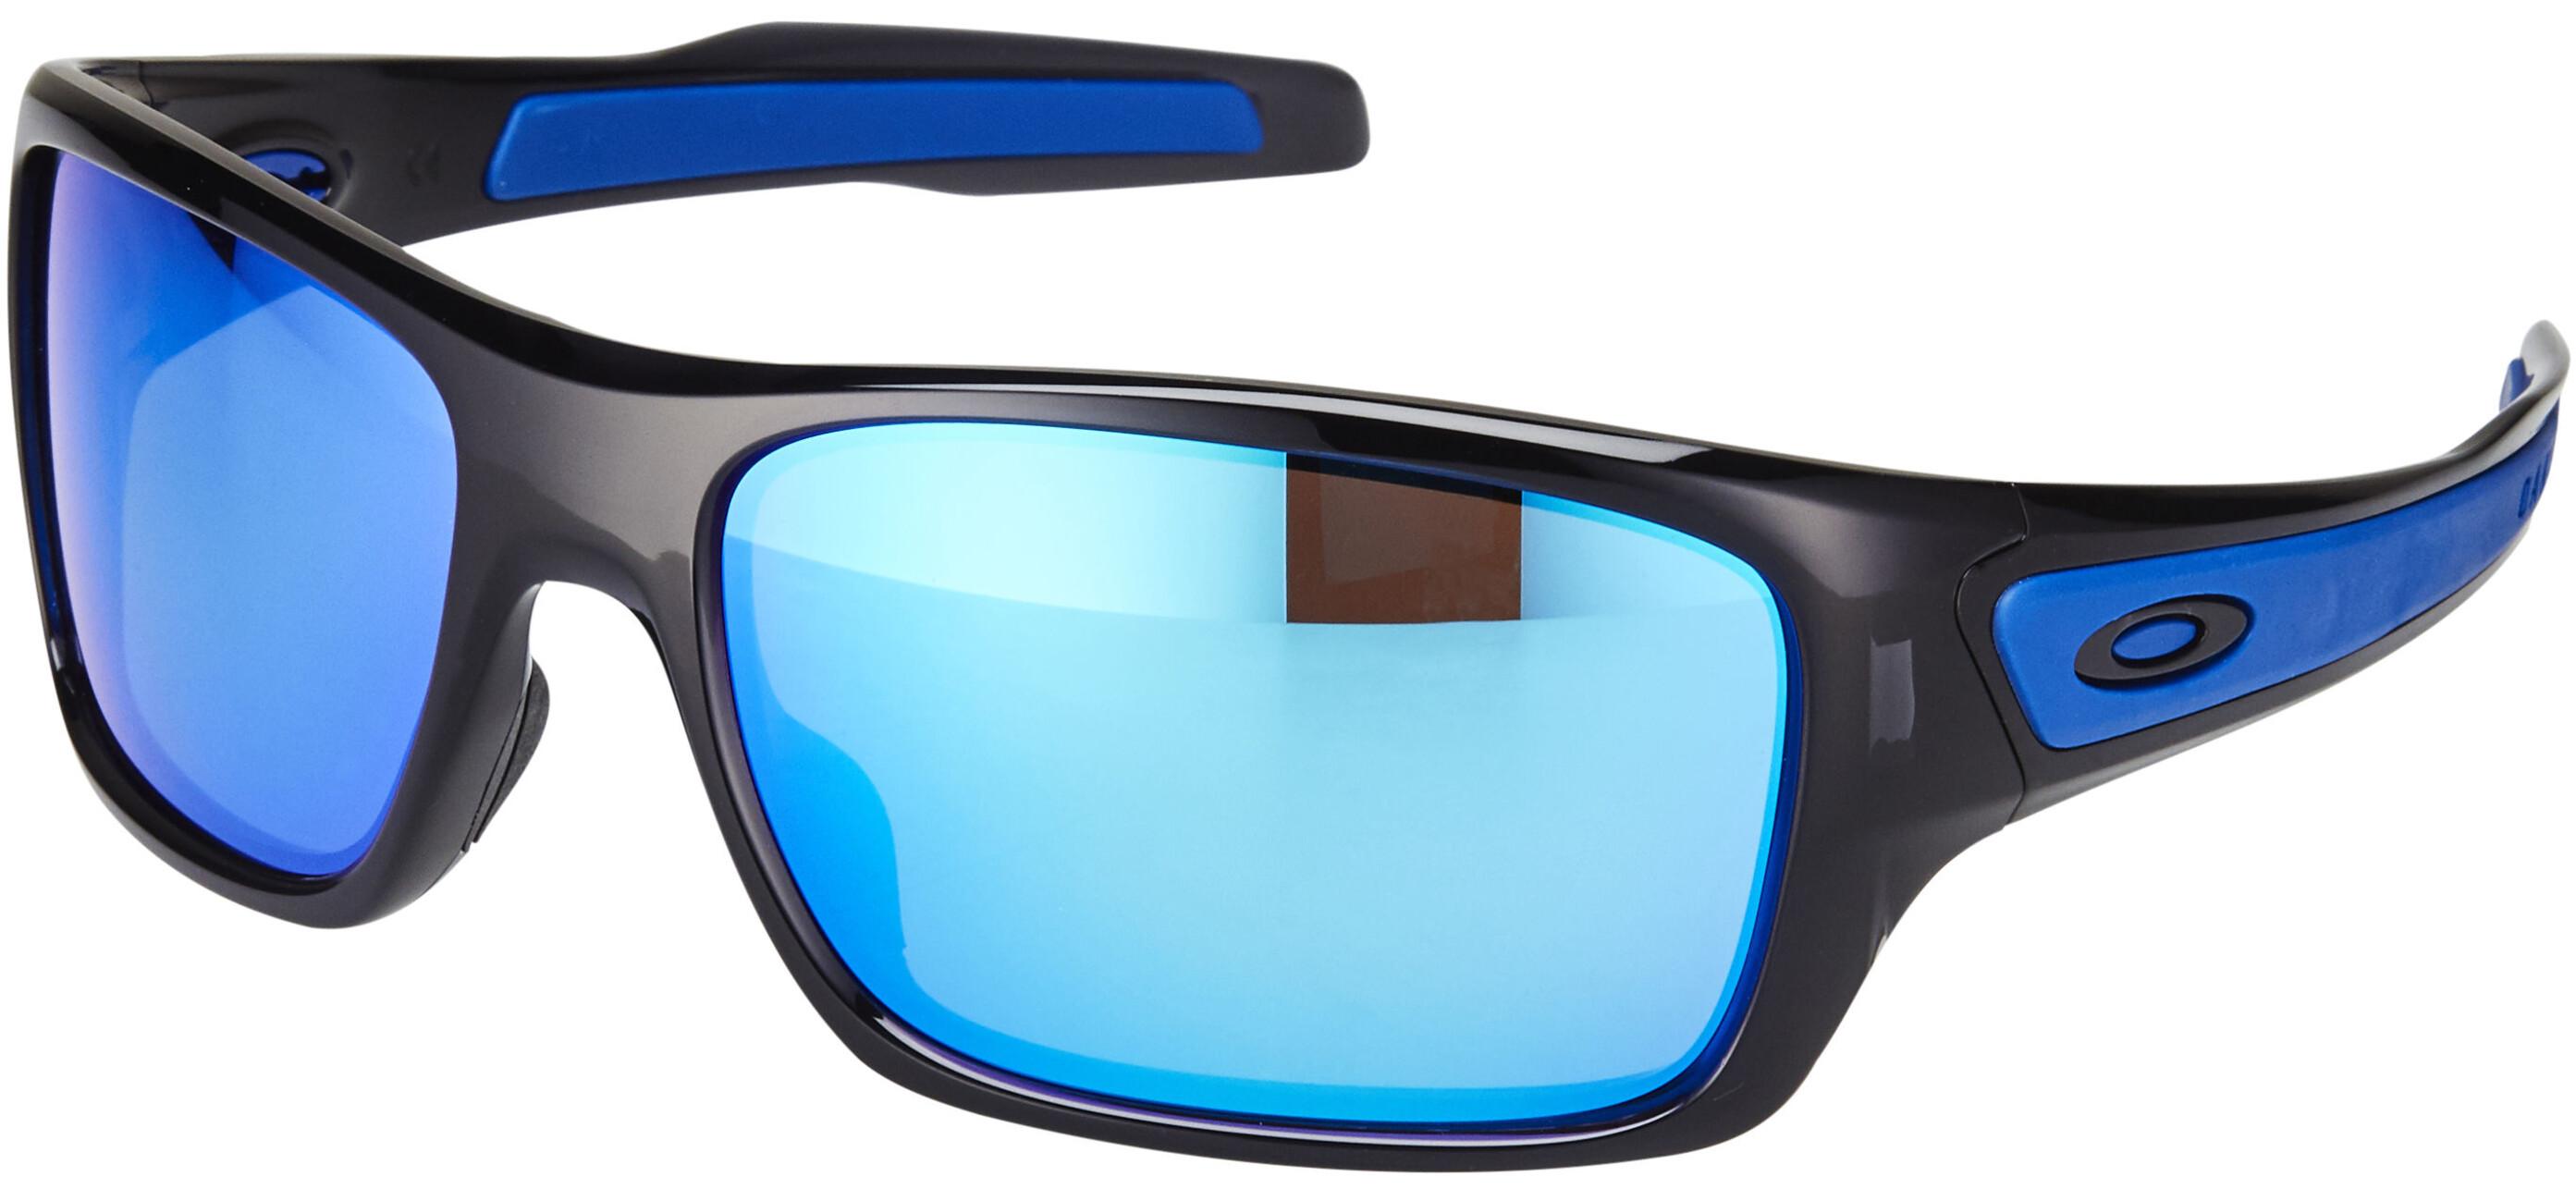 Oakley Turbine - Gafas ciclismo - azul negro   Bikester.es 201216206a